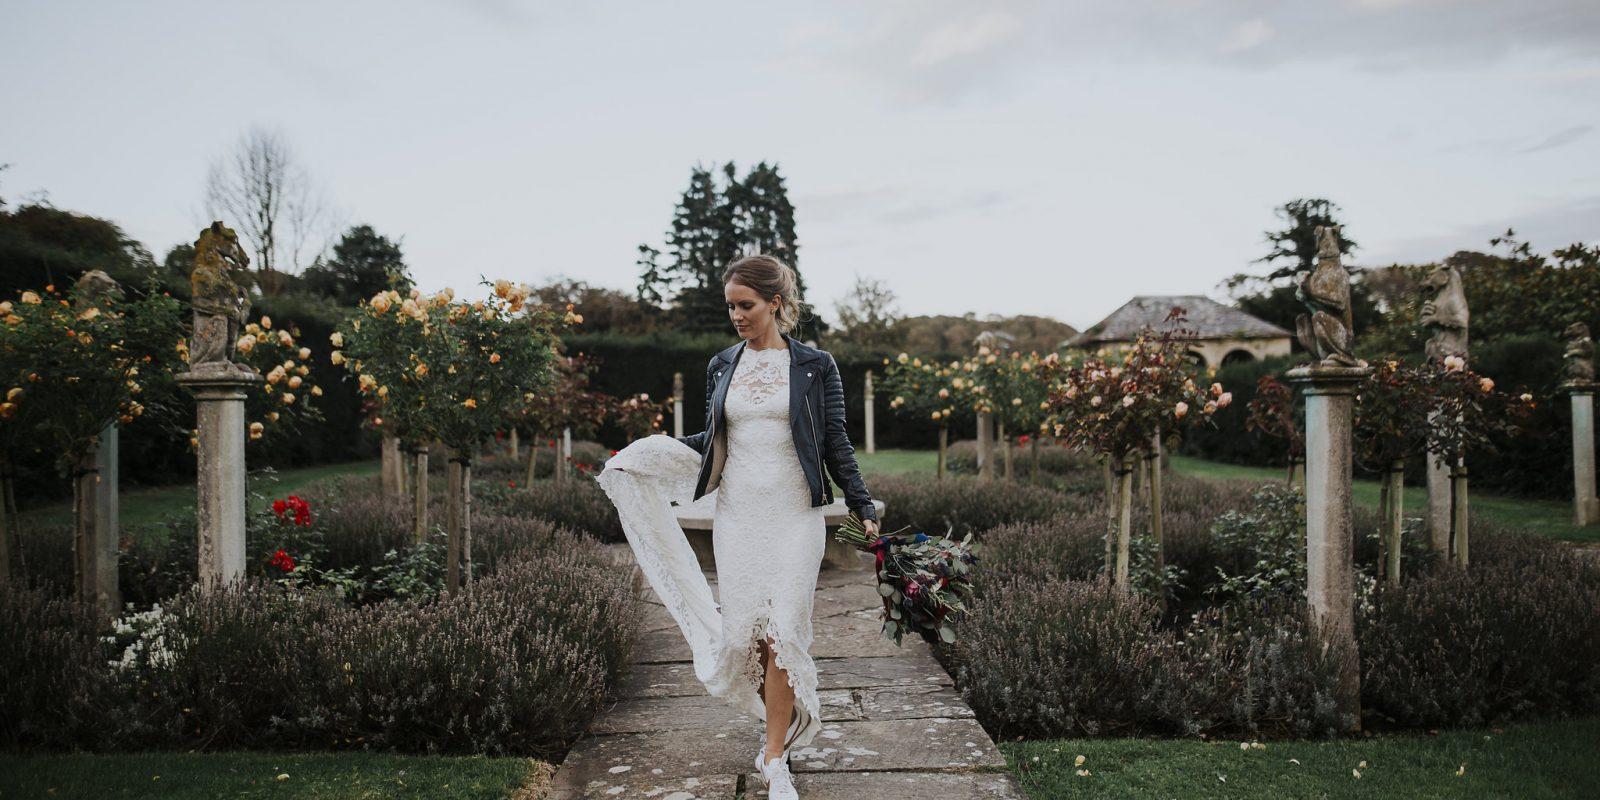 Luxury wedding venue in the vale of glamorgan